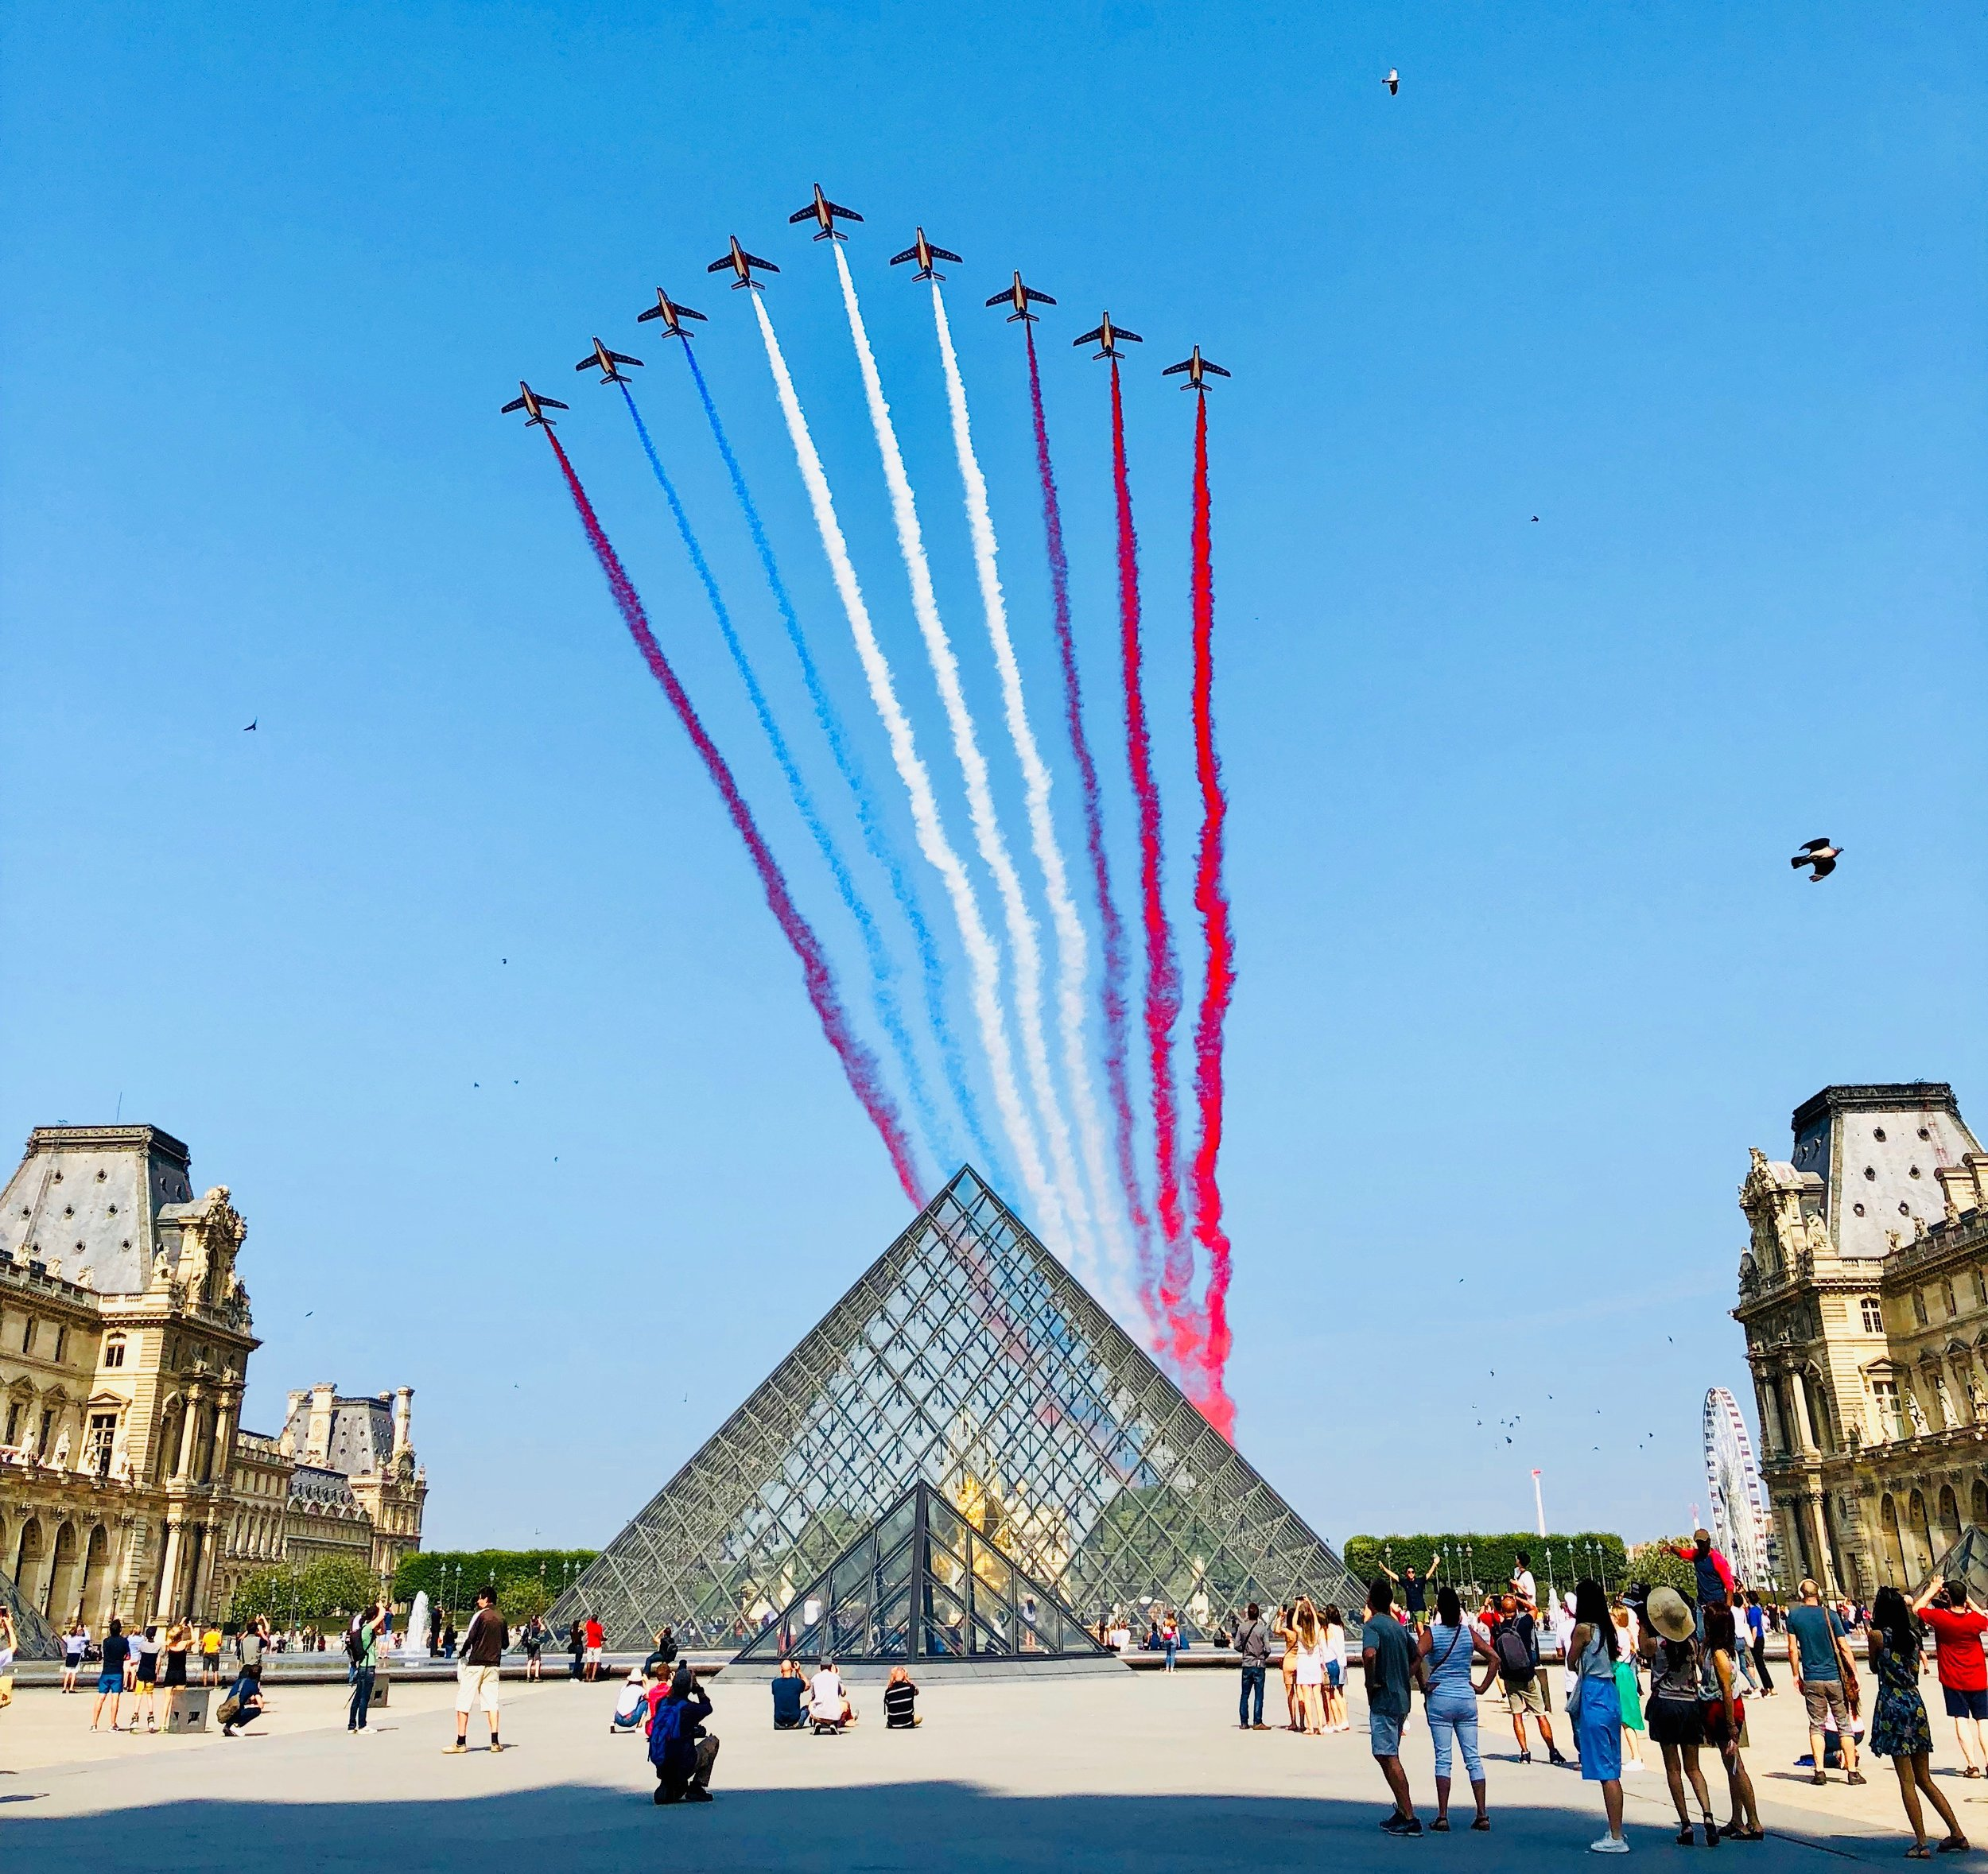 14 Juillet 2018— Bastille Day at the Louvre